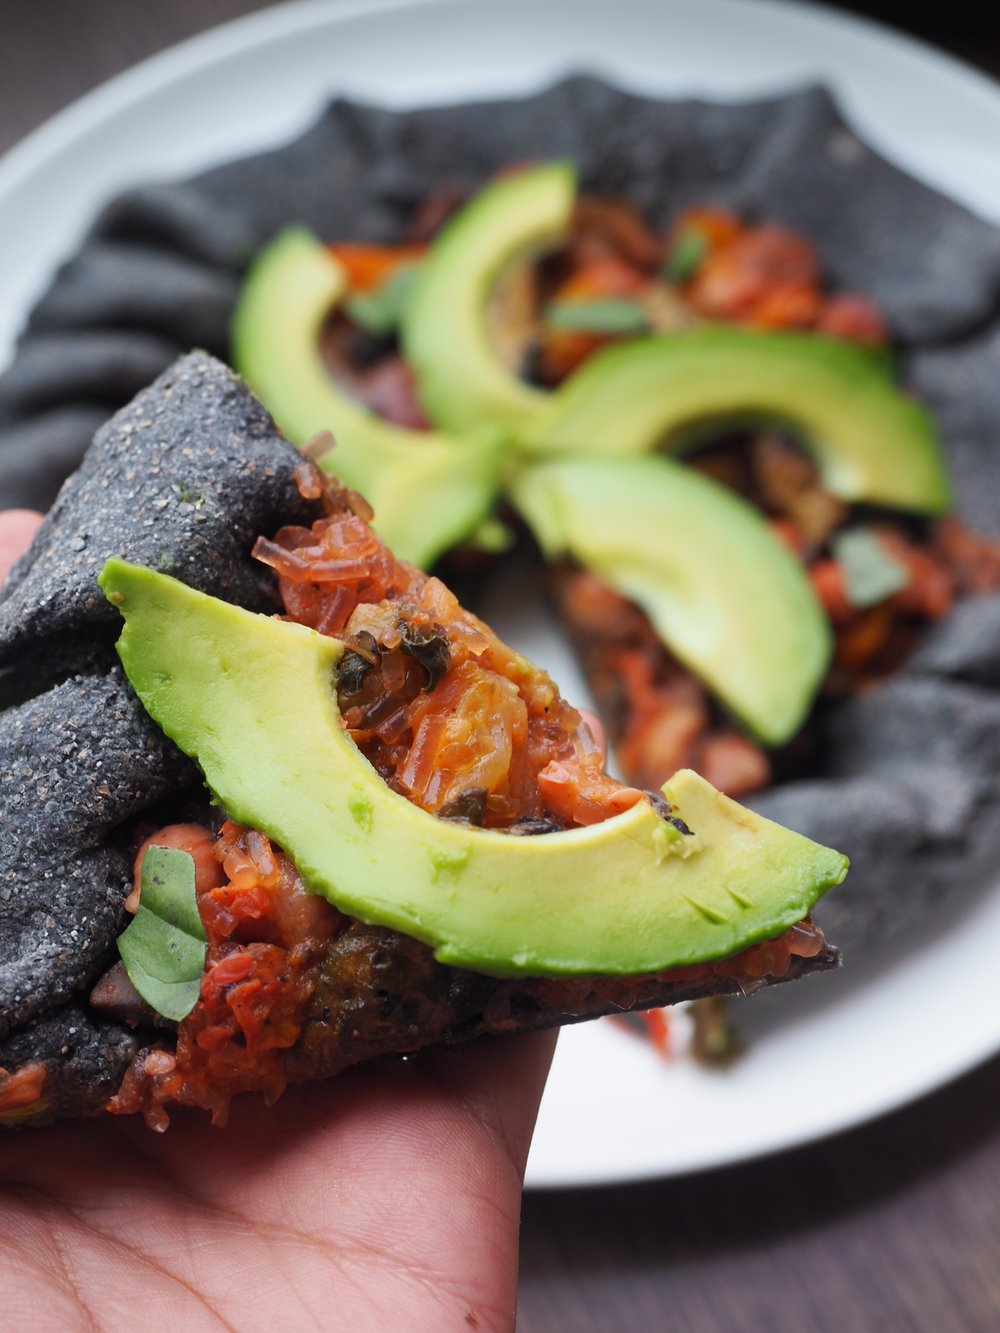 Guacamole stuffed crust pizza